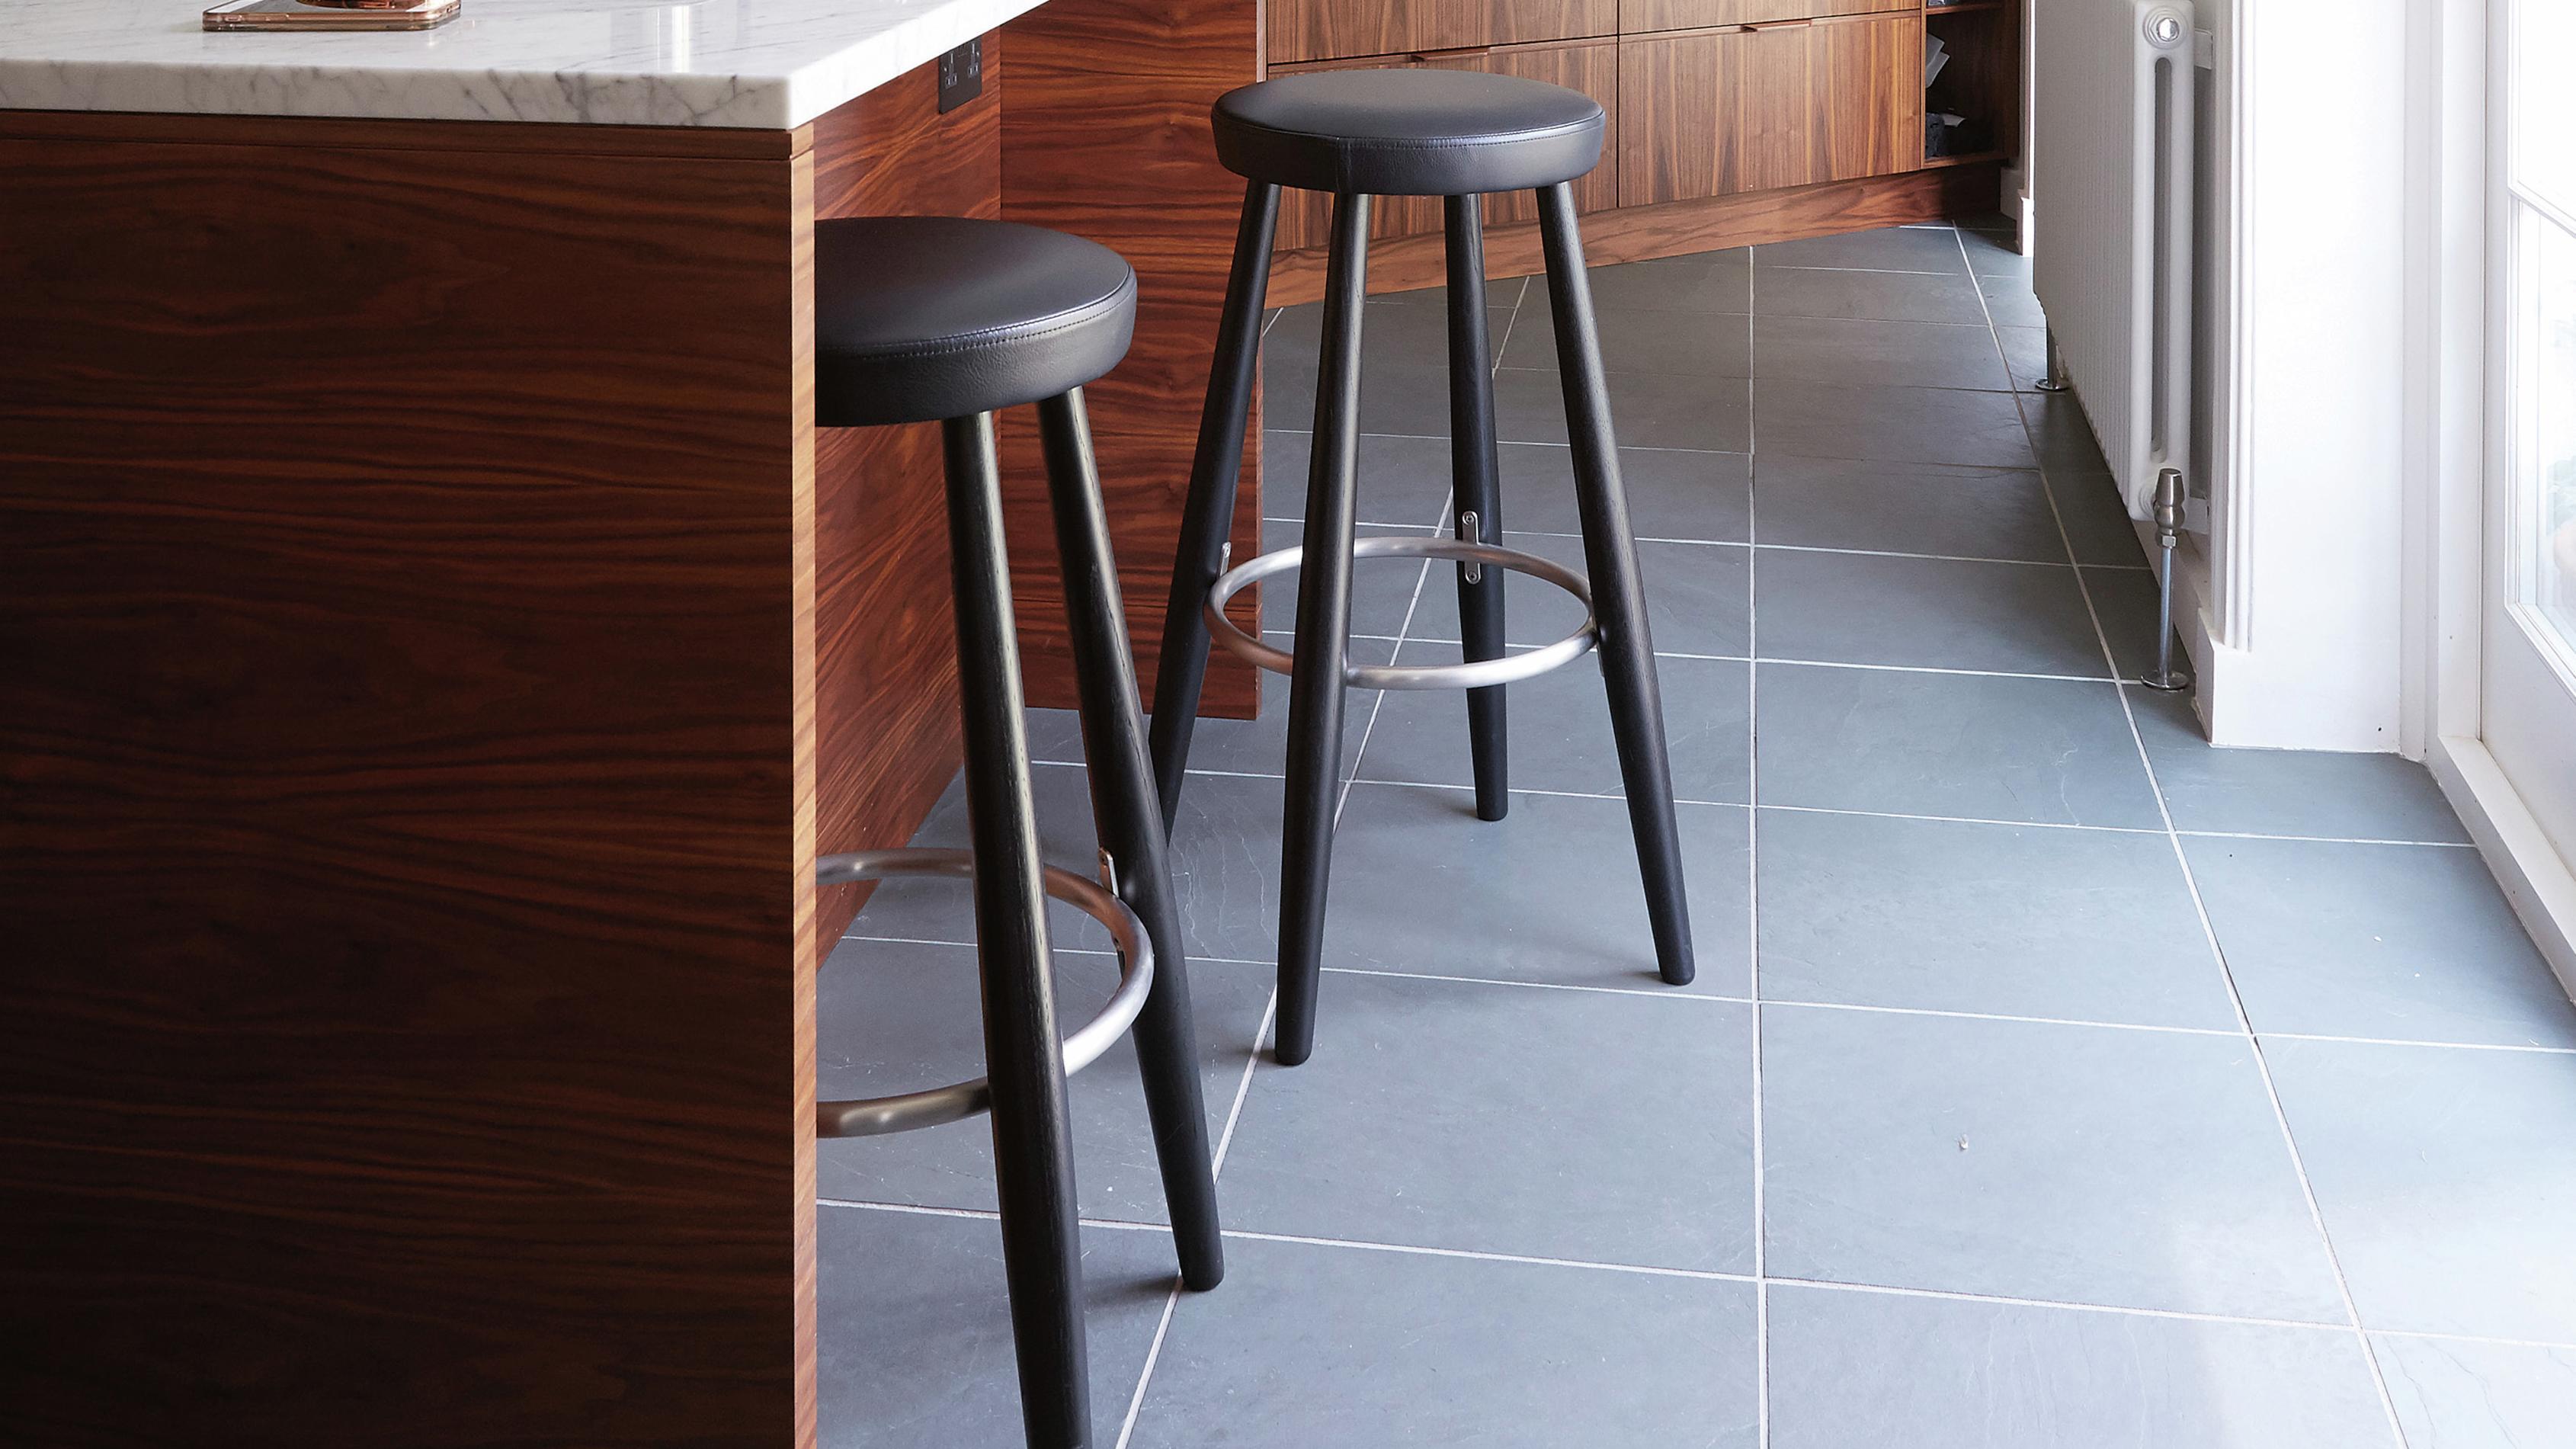 Grey ceramic tiles in a kitchen.